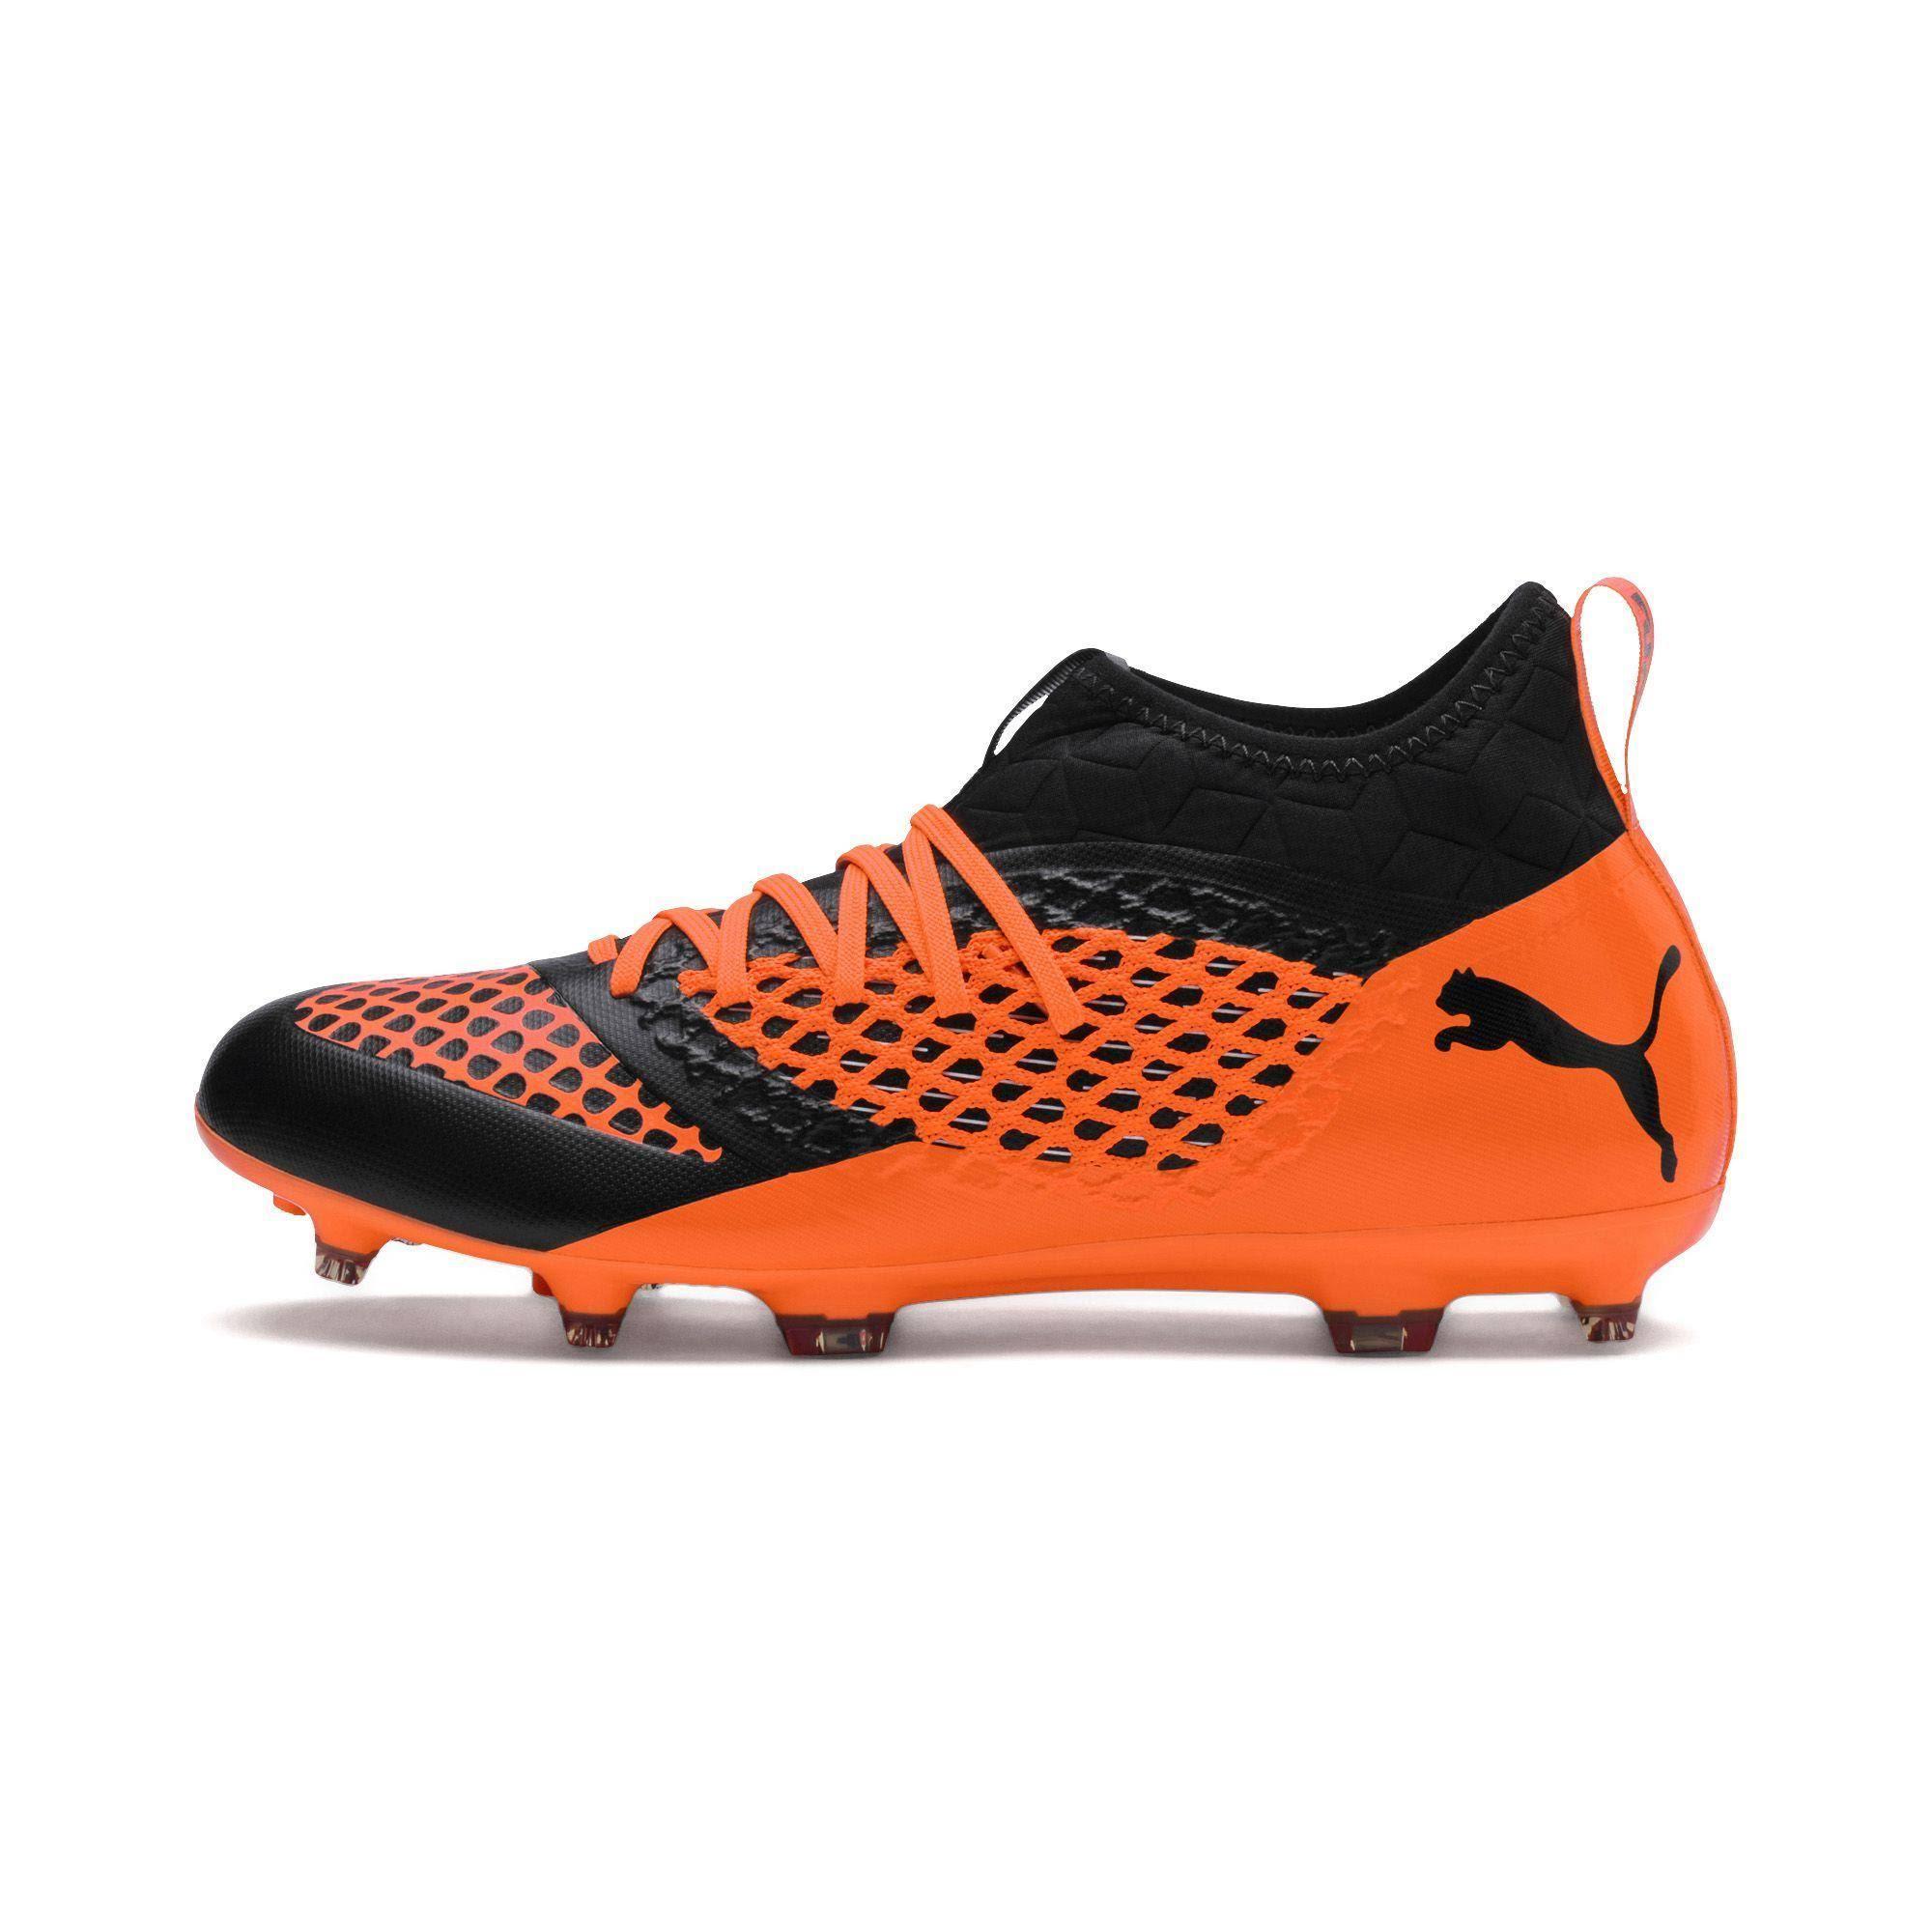 3 Negro Naranja Tierra Botas Soccer Netfit 104832 De Puma Firmes 02 Future 2 En AcUtTnqO